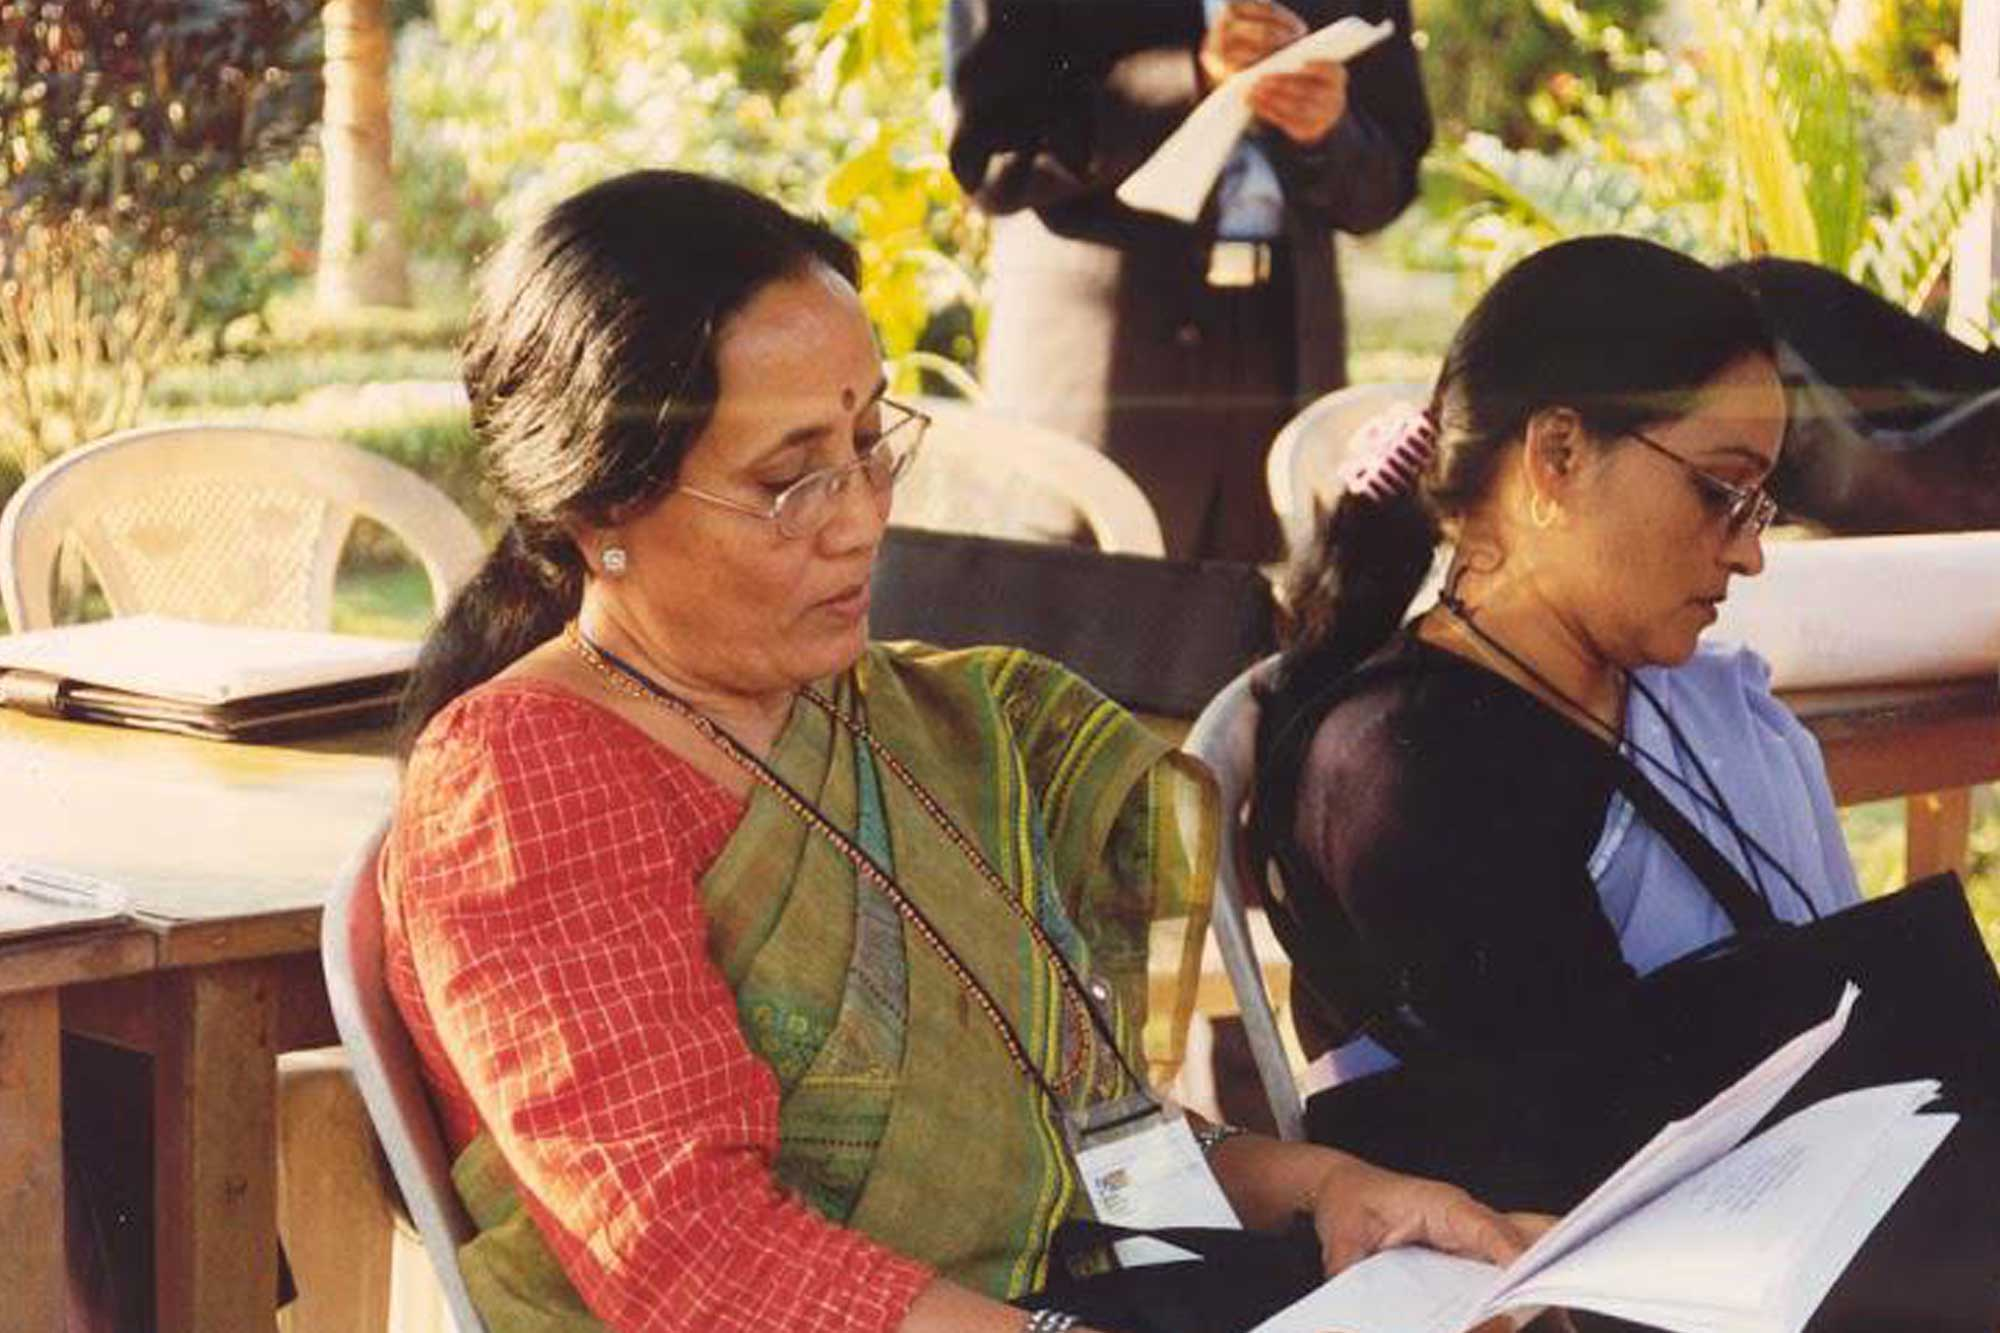 Women reading a paper